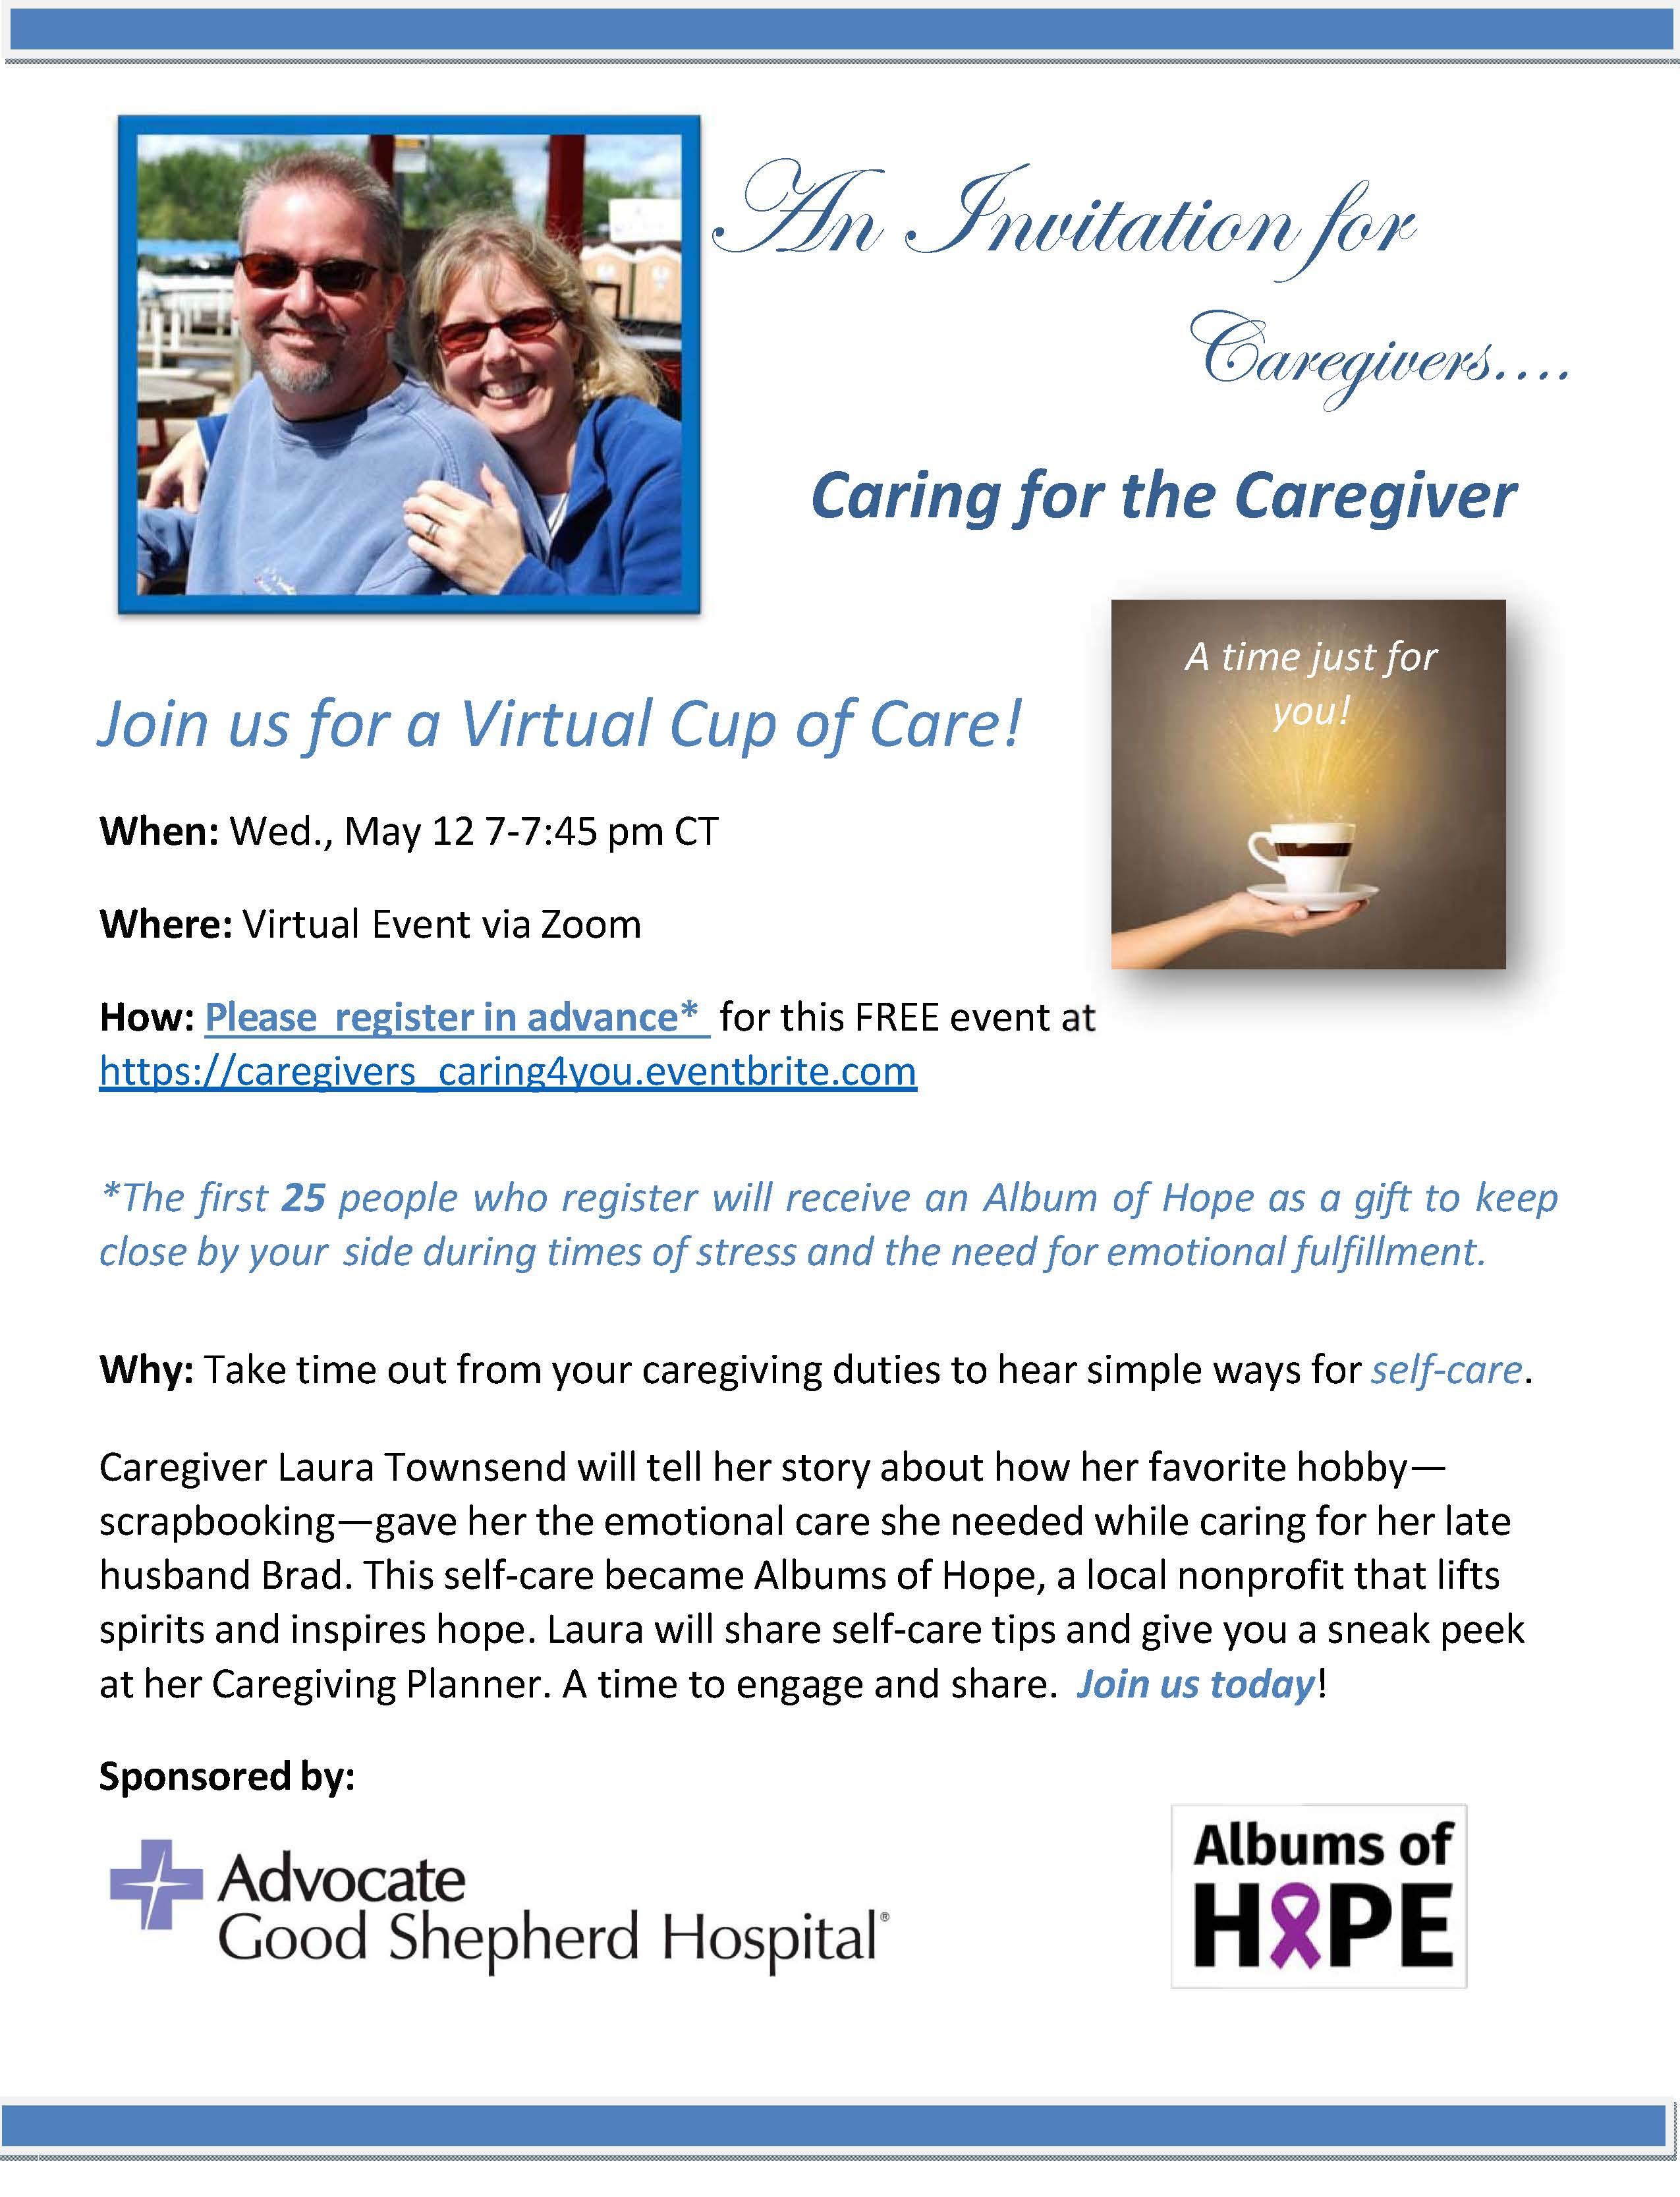 Caregivers caring for you webinar 5 12 2021 flyer final lyzji5